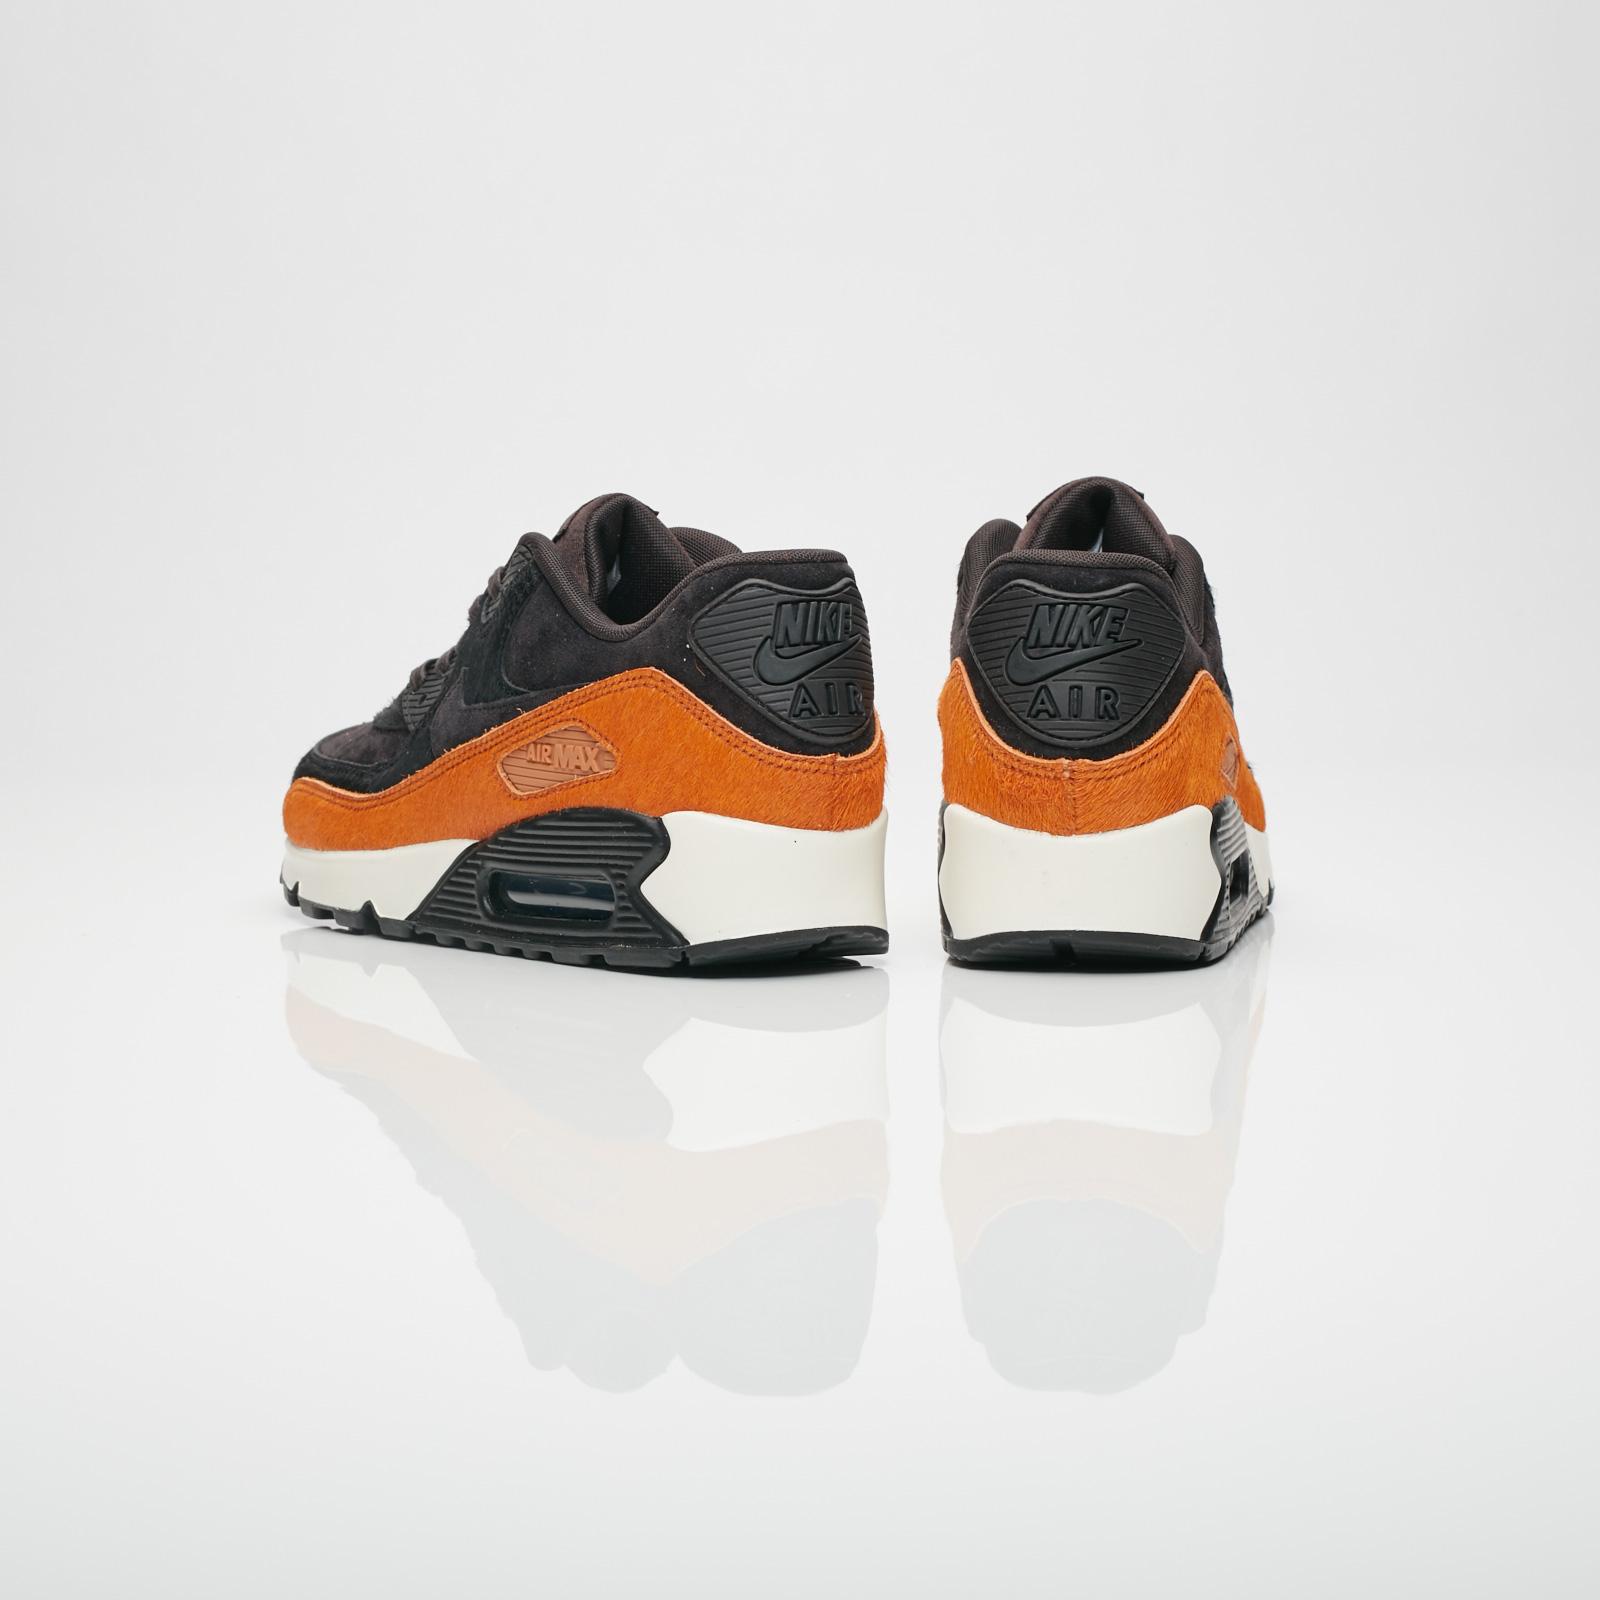 finest selection 83fa5 61520 Nike Wmns Air Max 90 LX - 898512-005 - Sneakersnstuff   sneakers    streetwear online since 1999